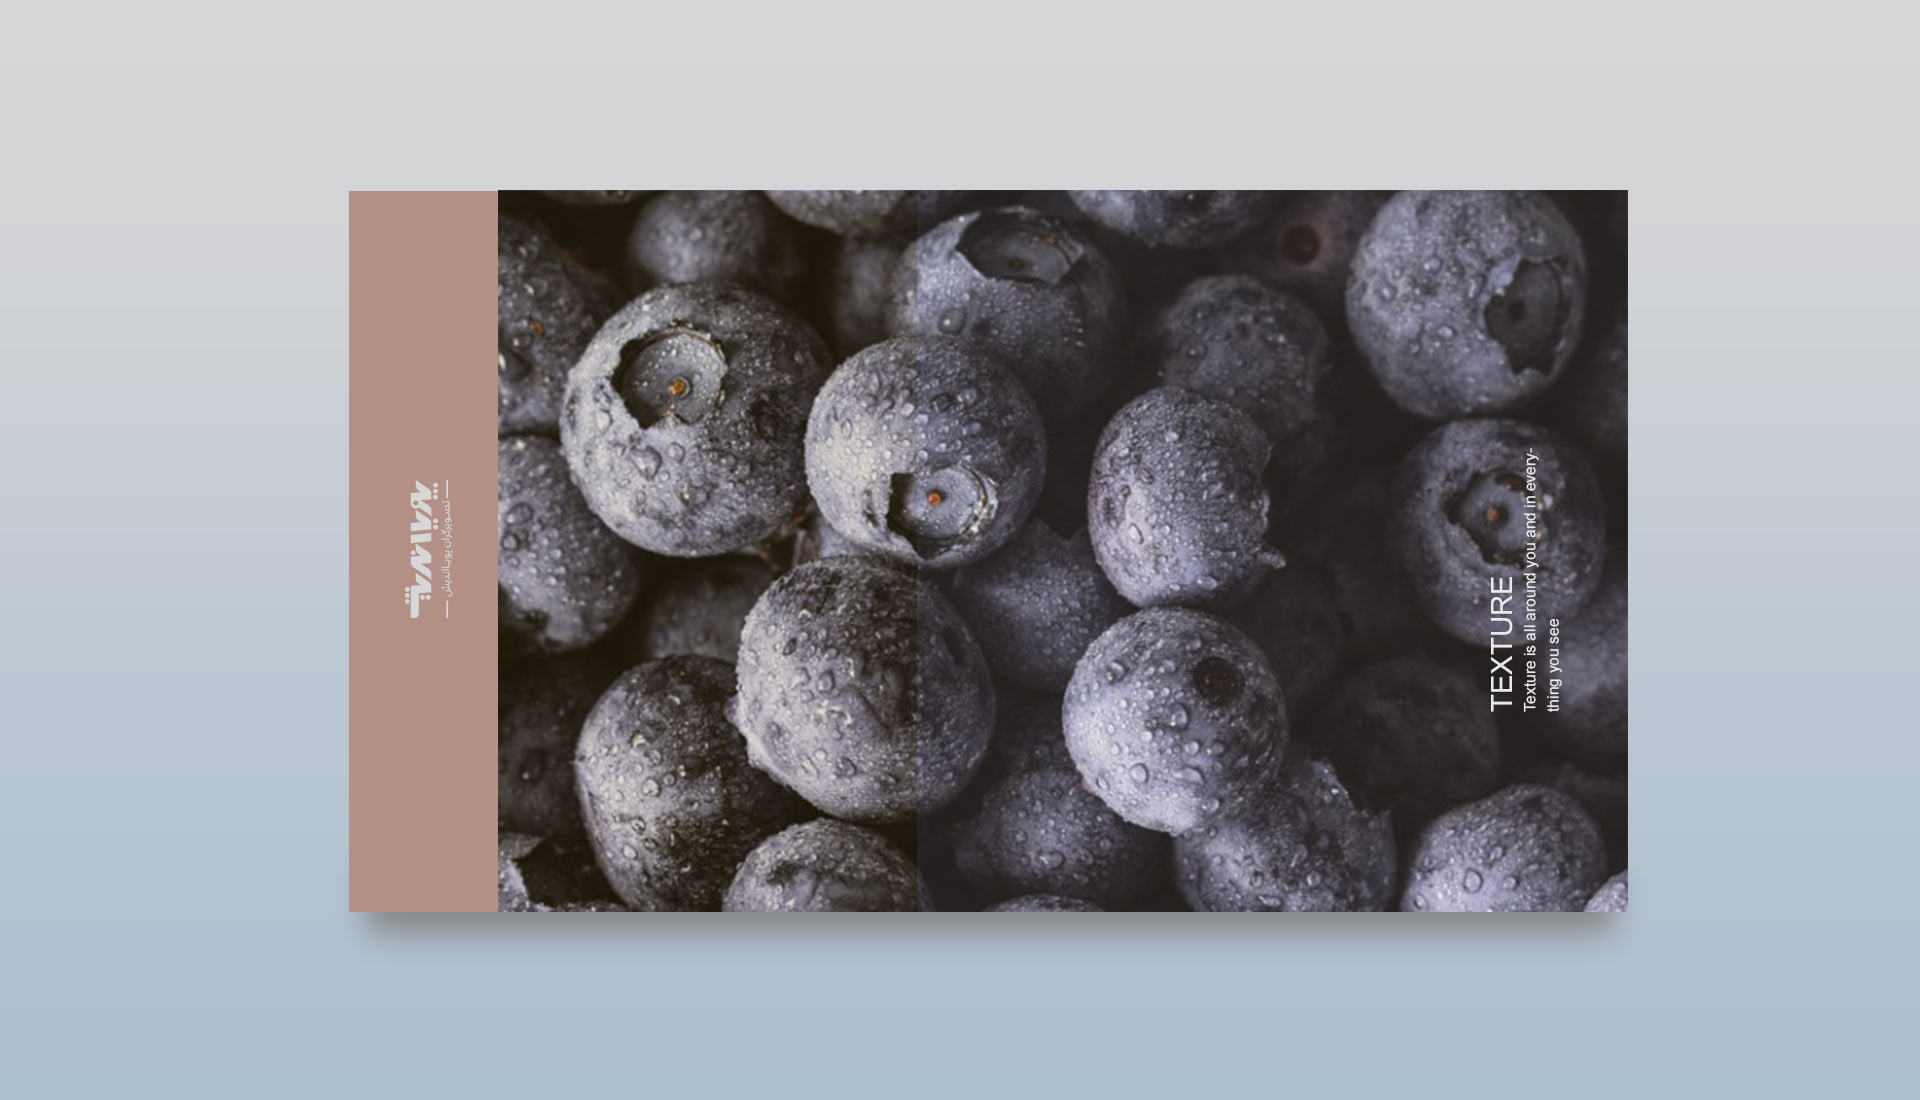 texture in photography 2 - تعادل در عکاسی